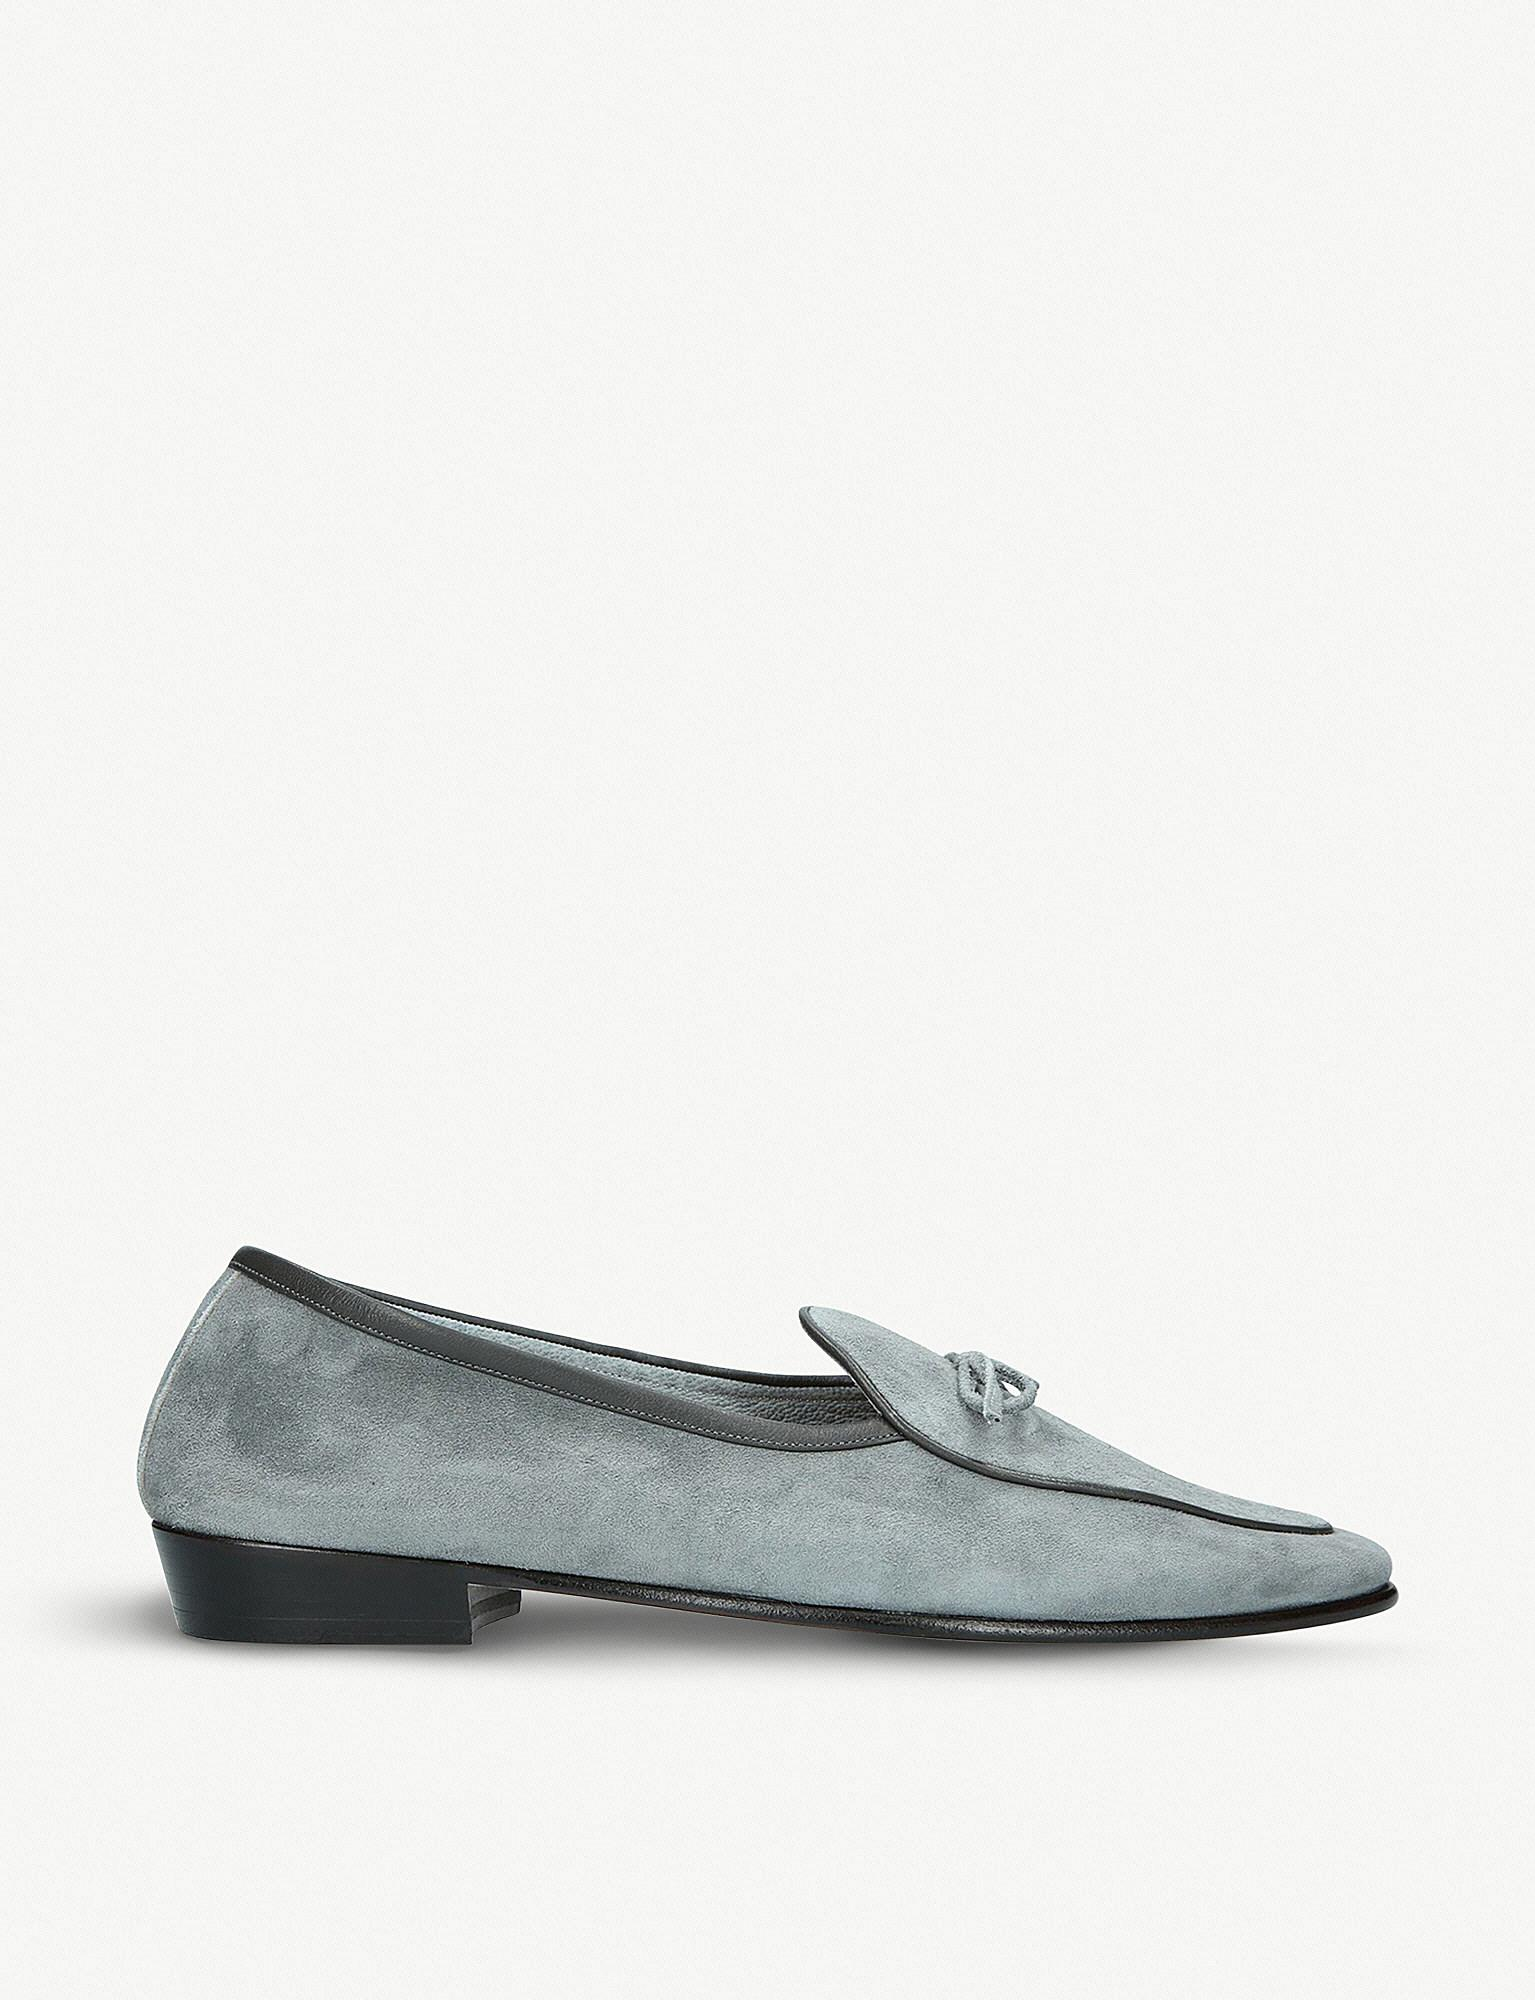 Discount Explore Discount Official Black Evening Wear Patent Loafers Baudoin & Lange qbpXI9